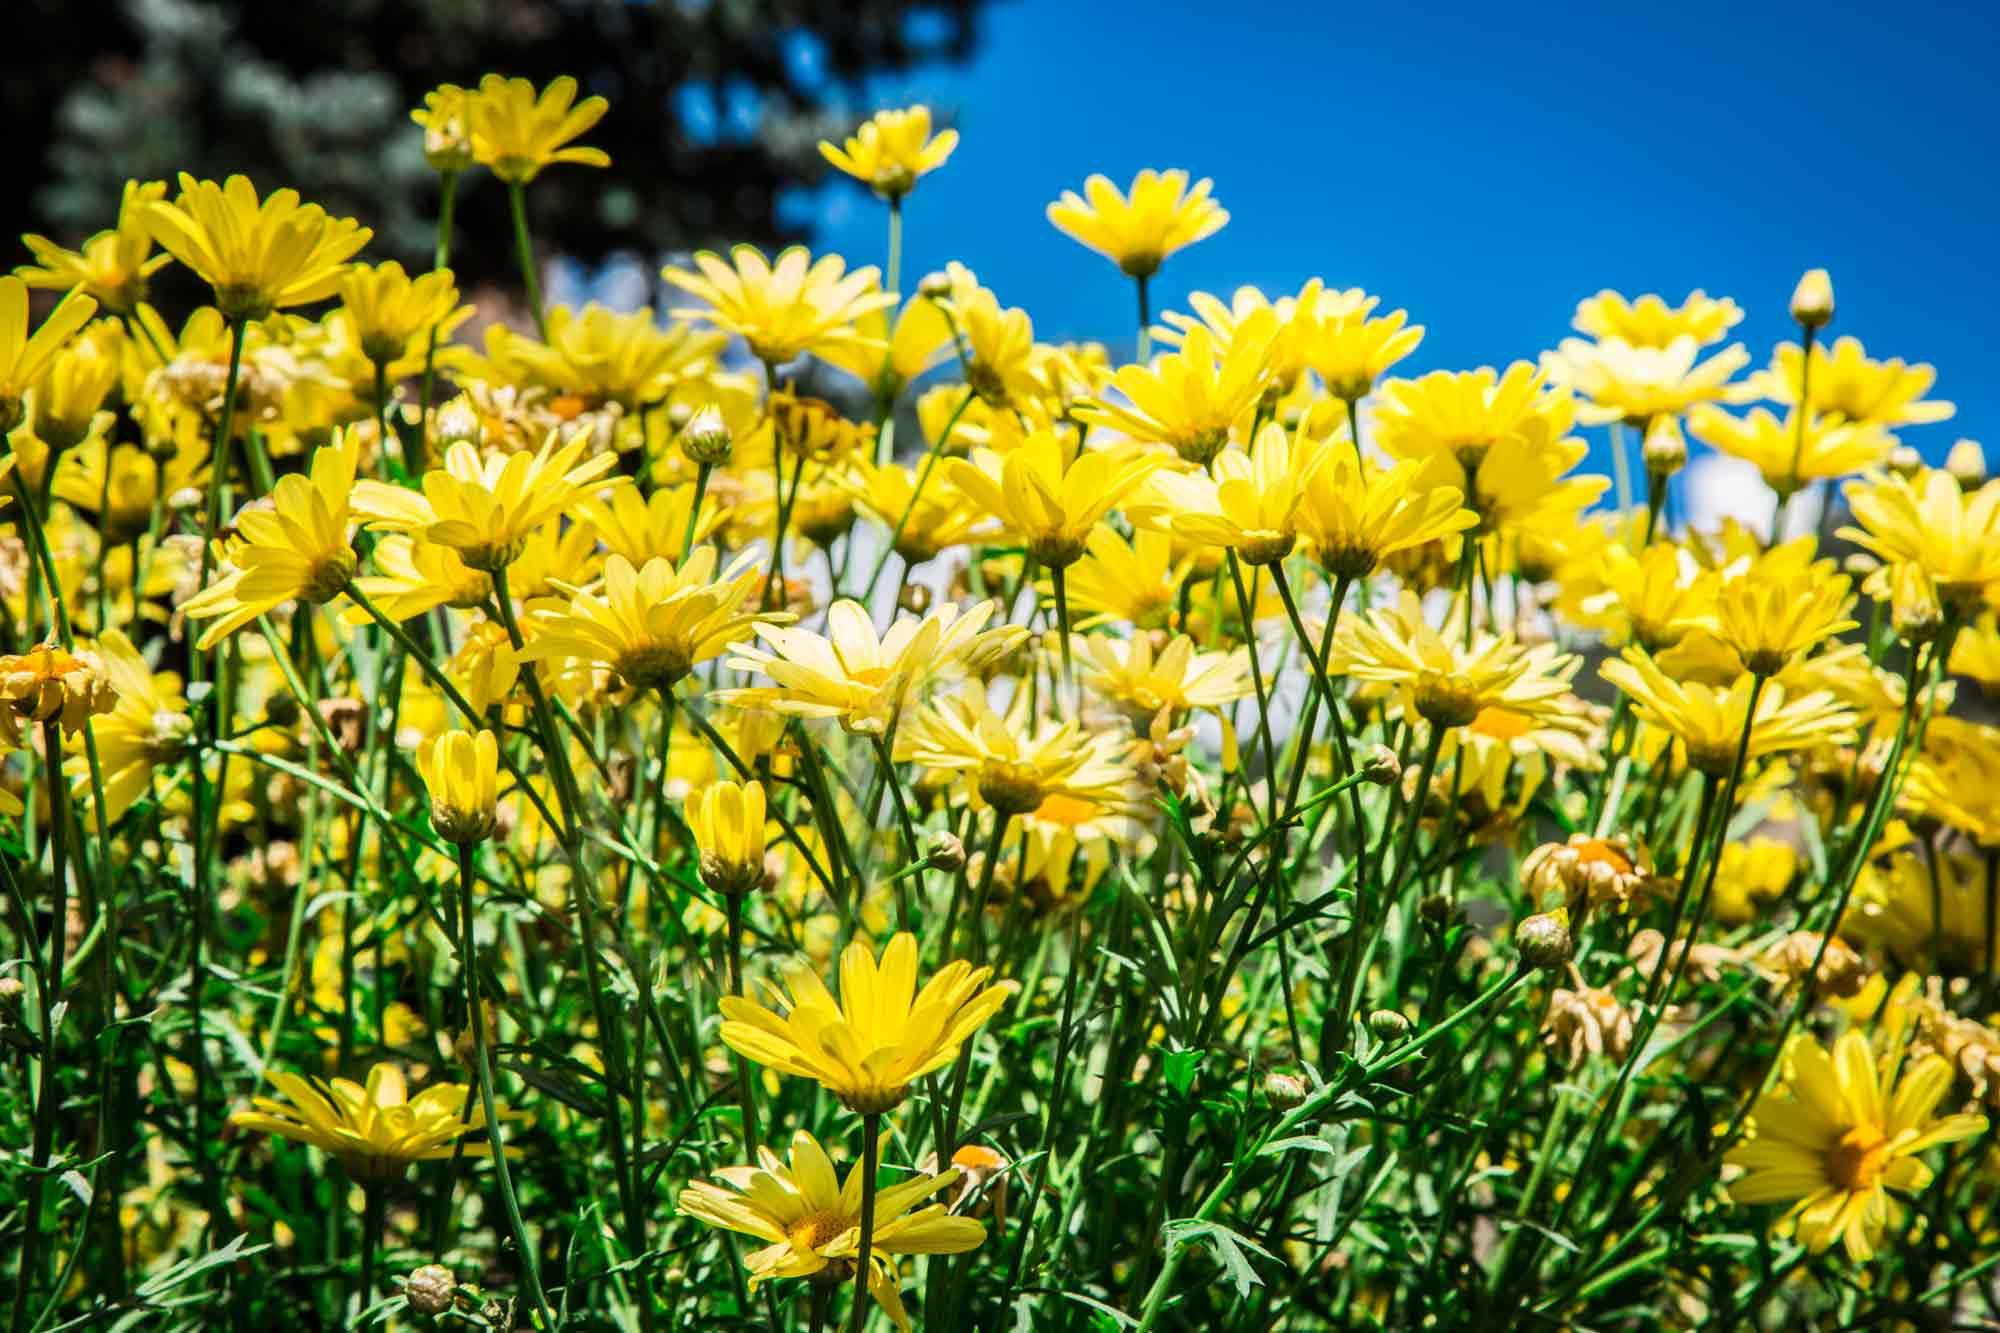 blues & bbq festival Idaho Springs, CO - sunflowers